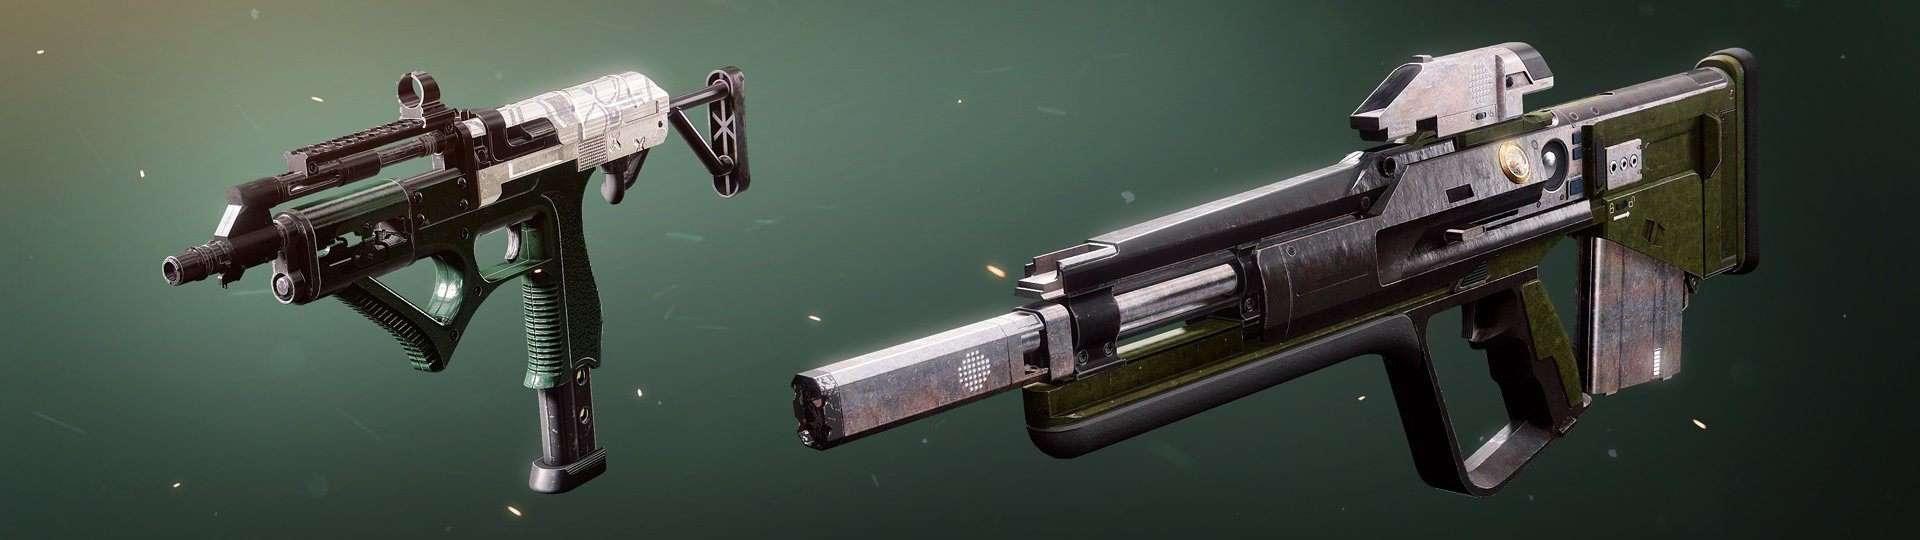 Destiny 2 Iron Banner Season 13 weapons